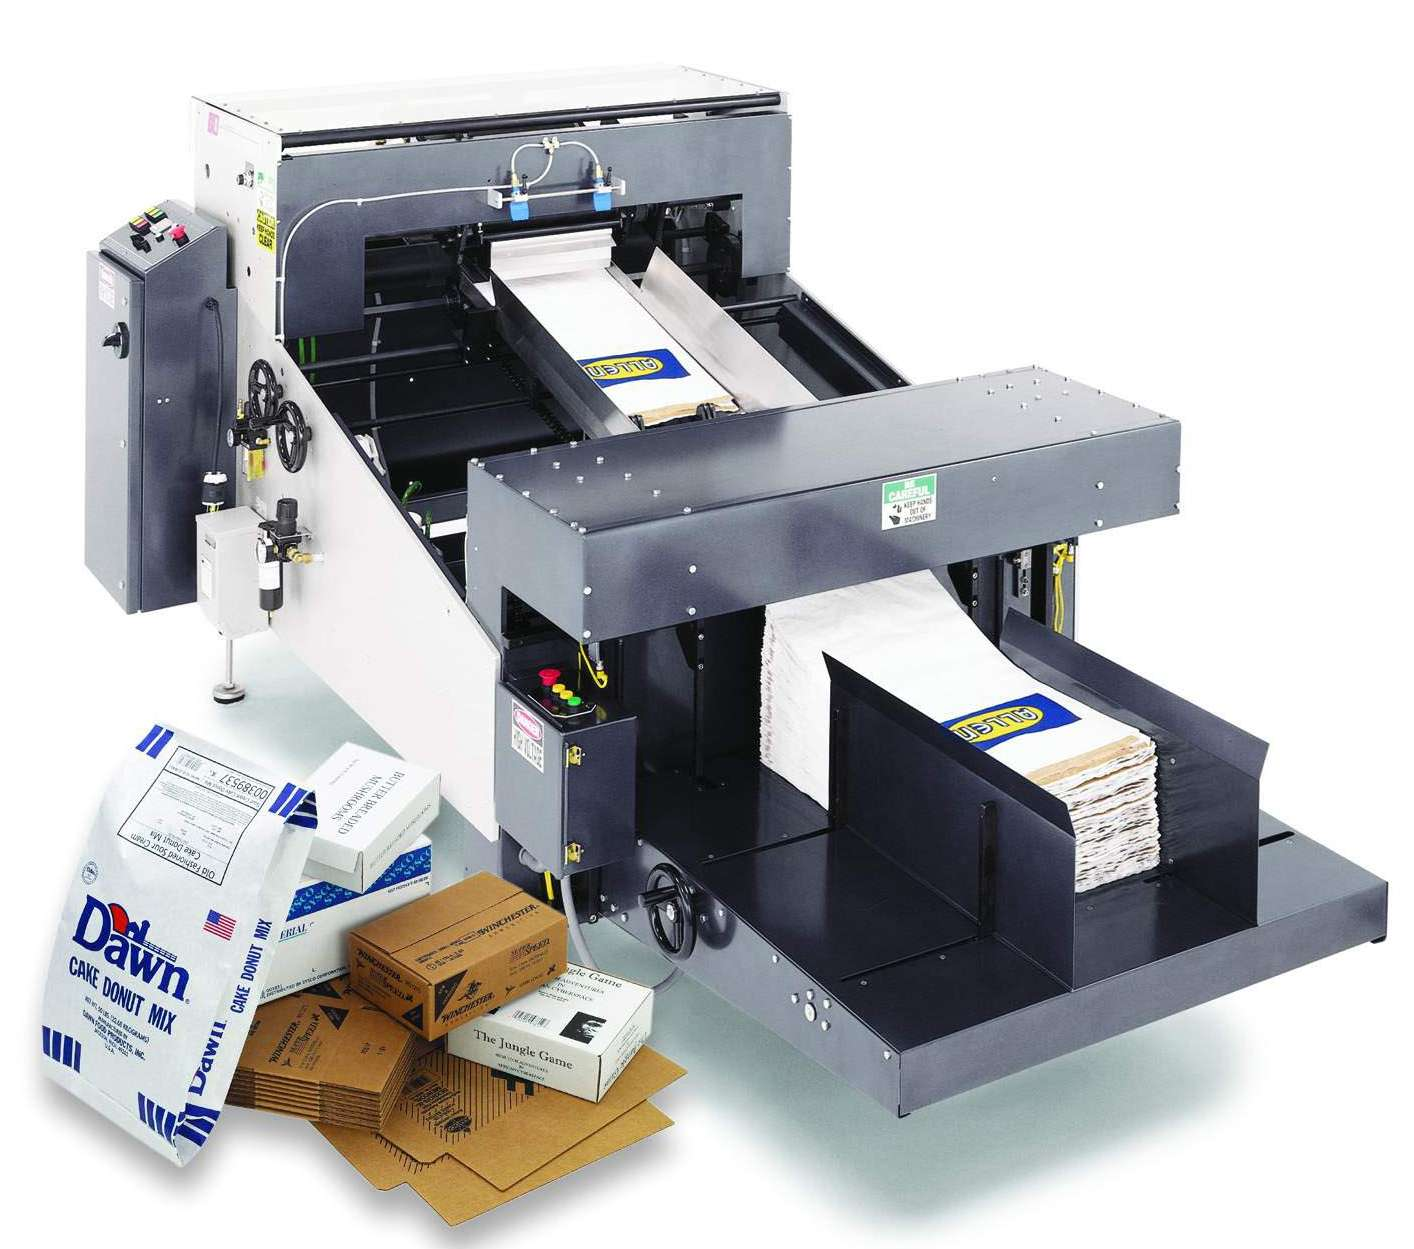 case solution of vishala printing press 5906 offset printers in mumbai find ✓digital printers, ✓pamphlet printers, ✓ printing press, ✓printing services, ✓paper  nilima print solution  vishal  printers.